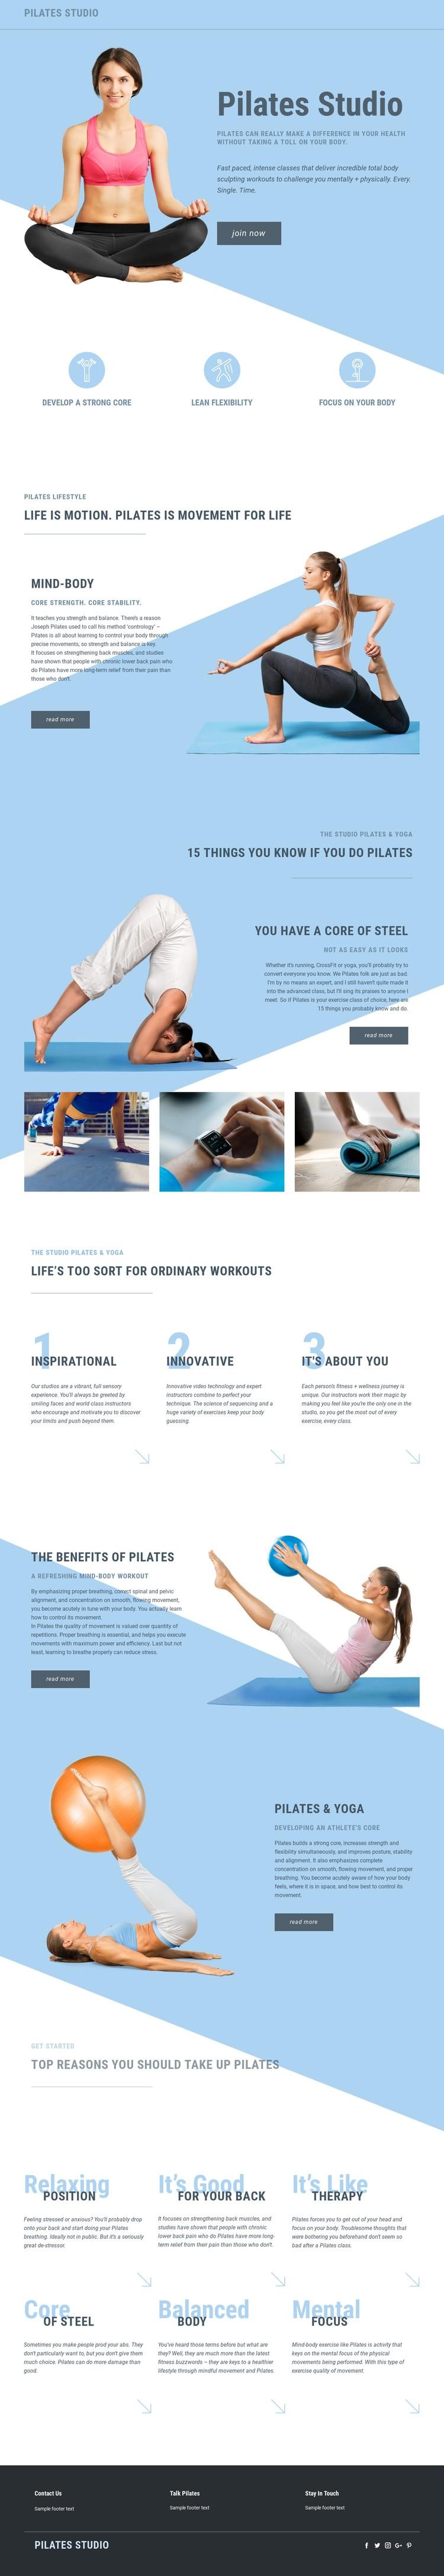 Pilates studio and sports Static Site Generator